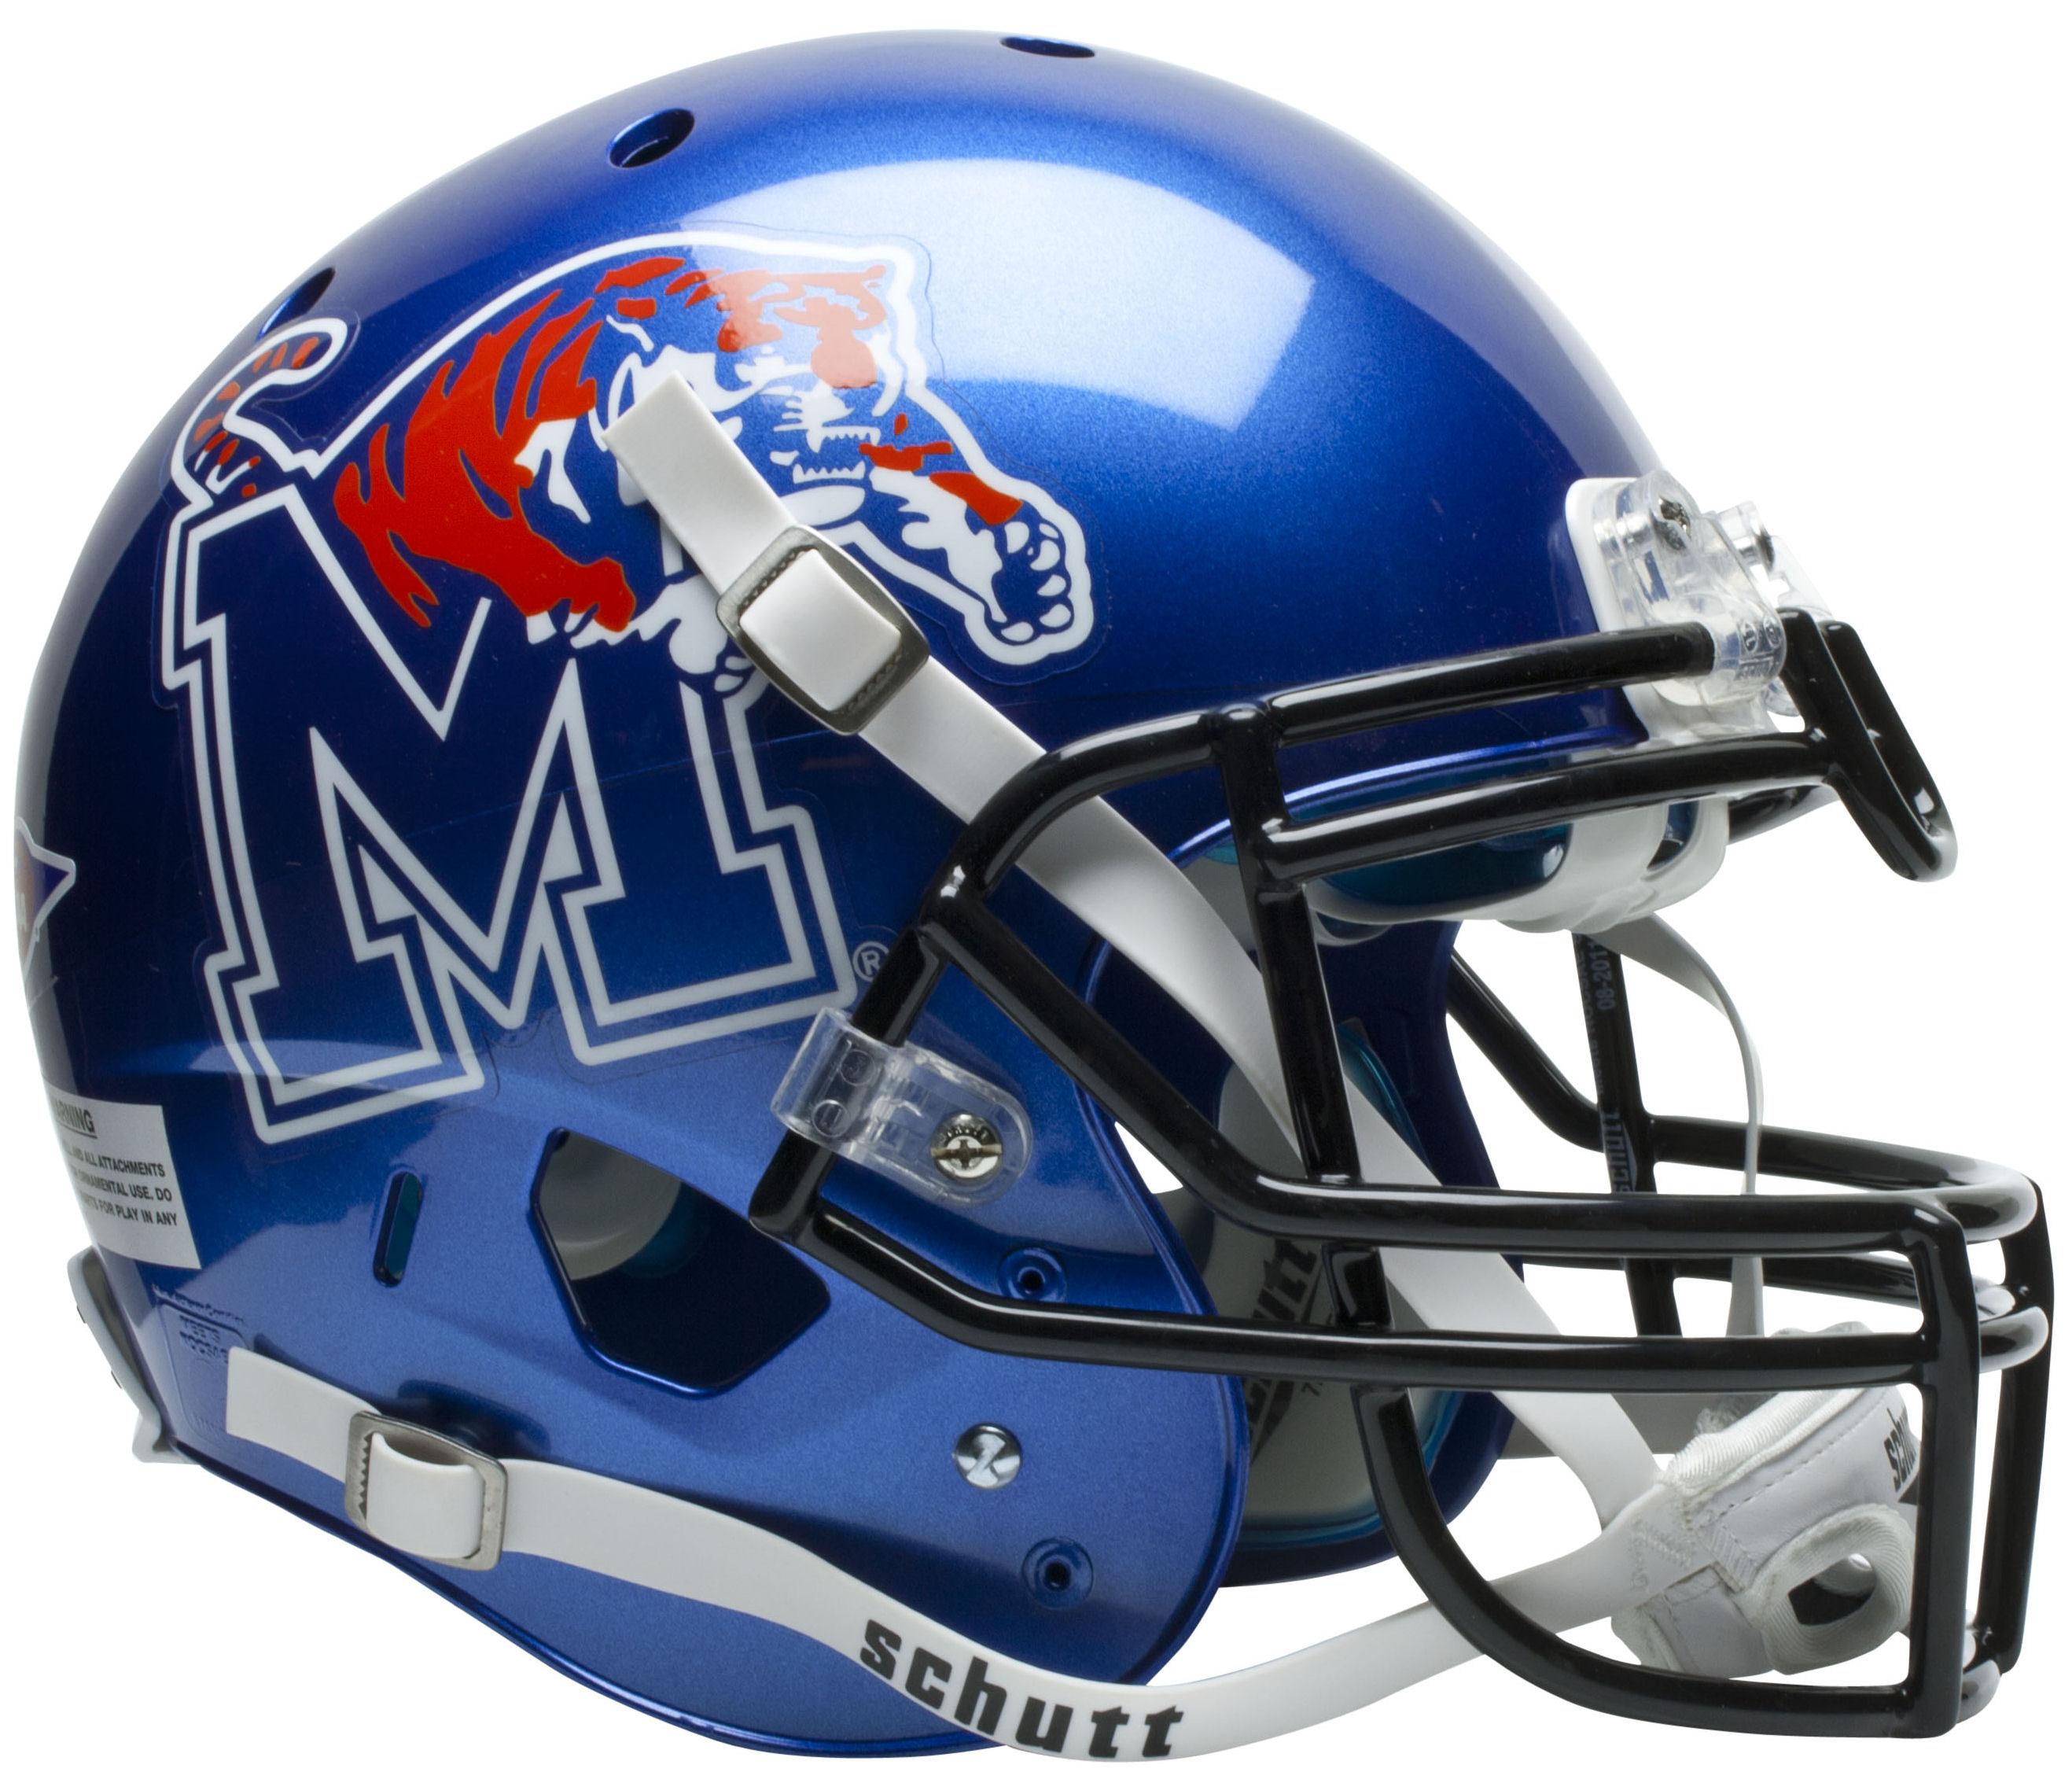 Memphis Tigers Authentic College XP Football Helmet Schutt